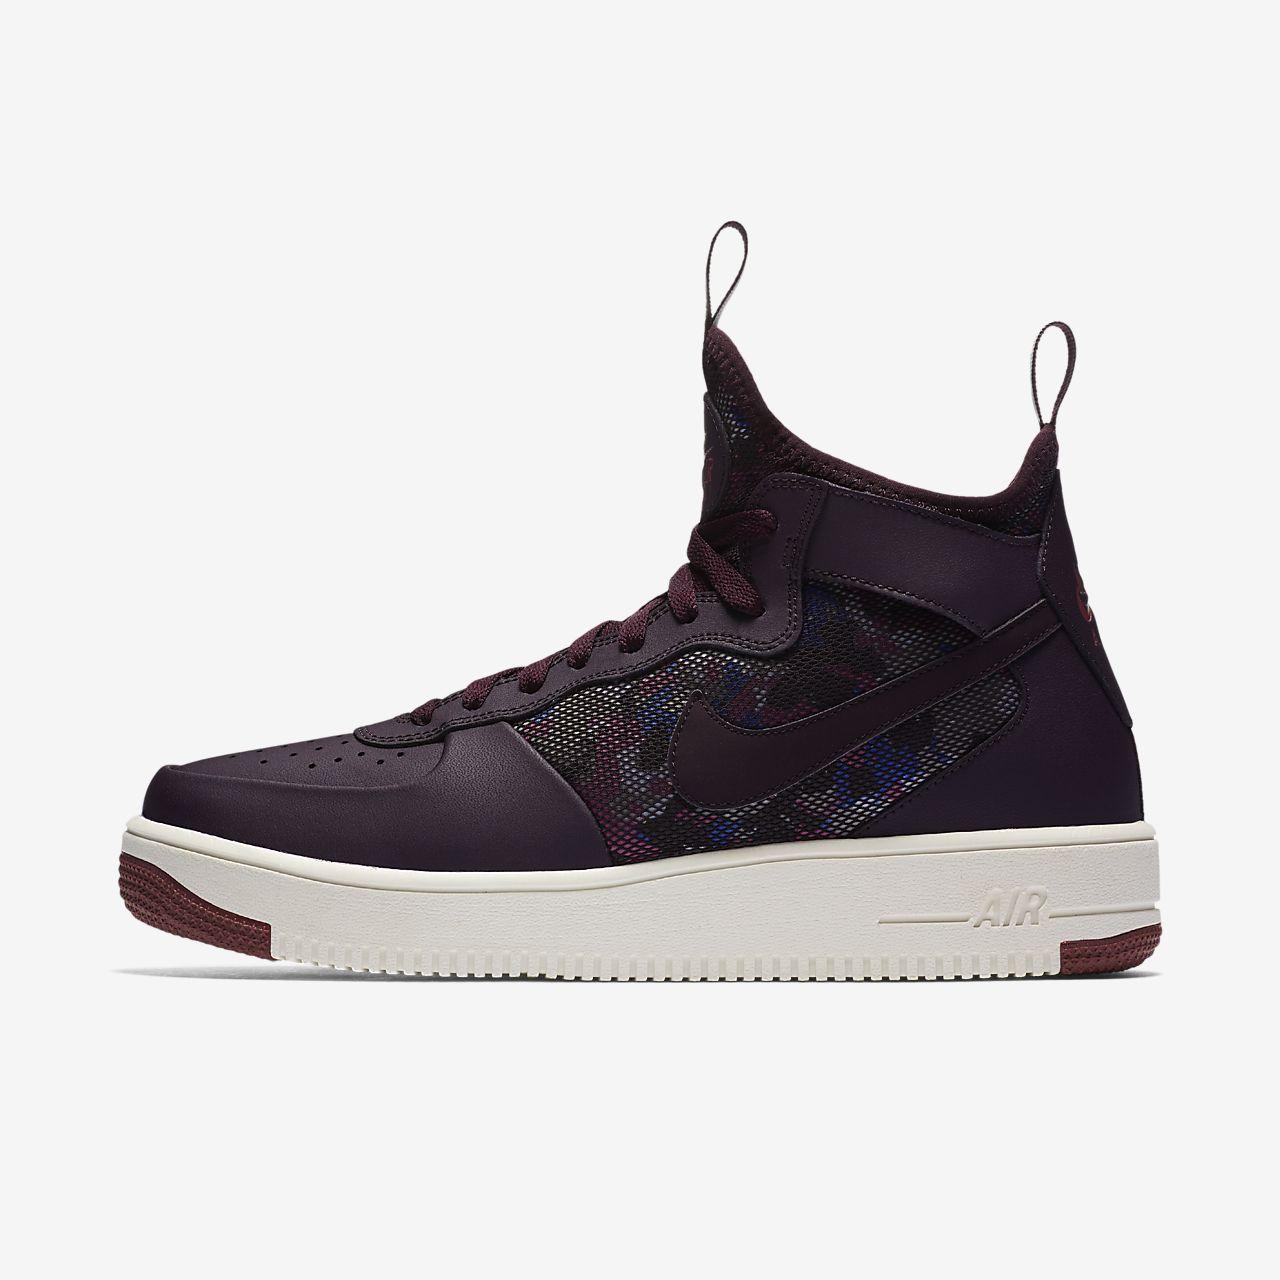 nike air force 1 mens basketball shoes style guru. Black Bedroom Furniture Sets. Home Design Ideas